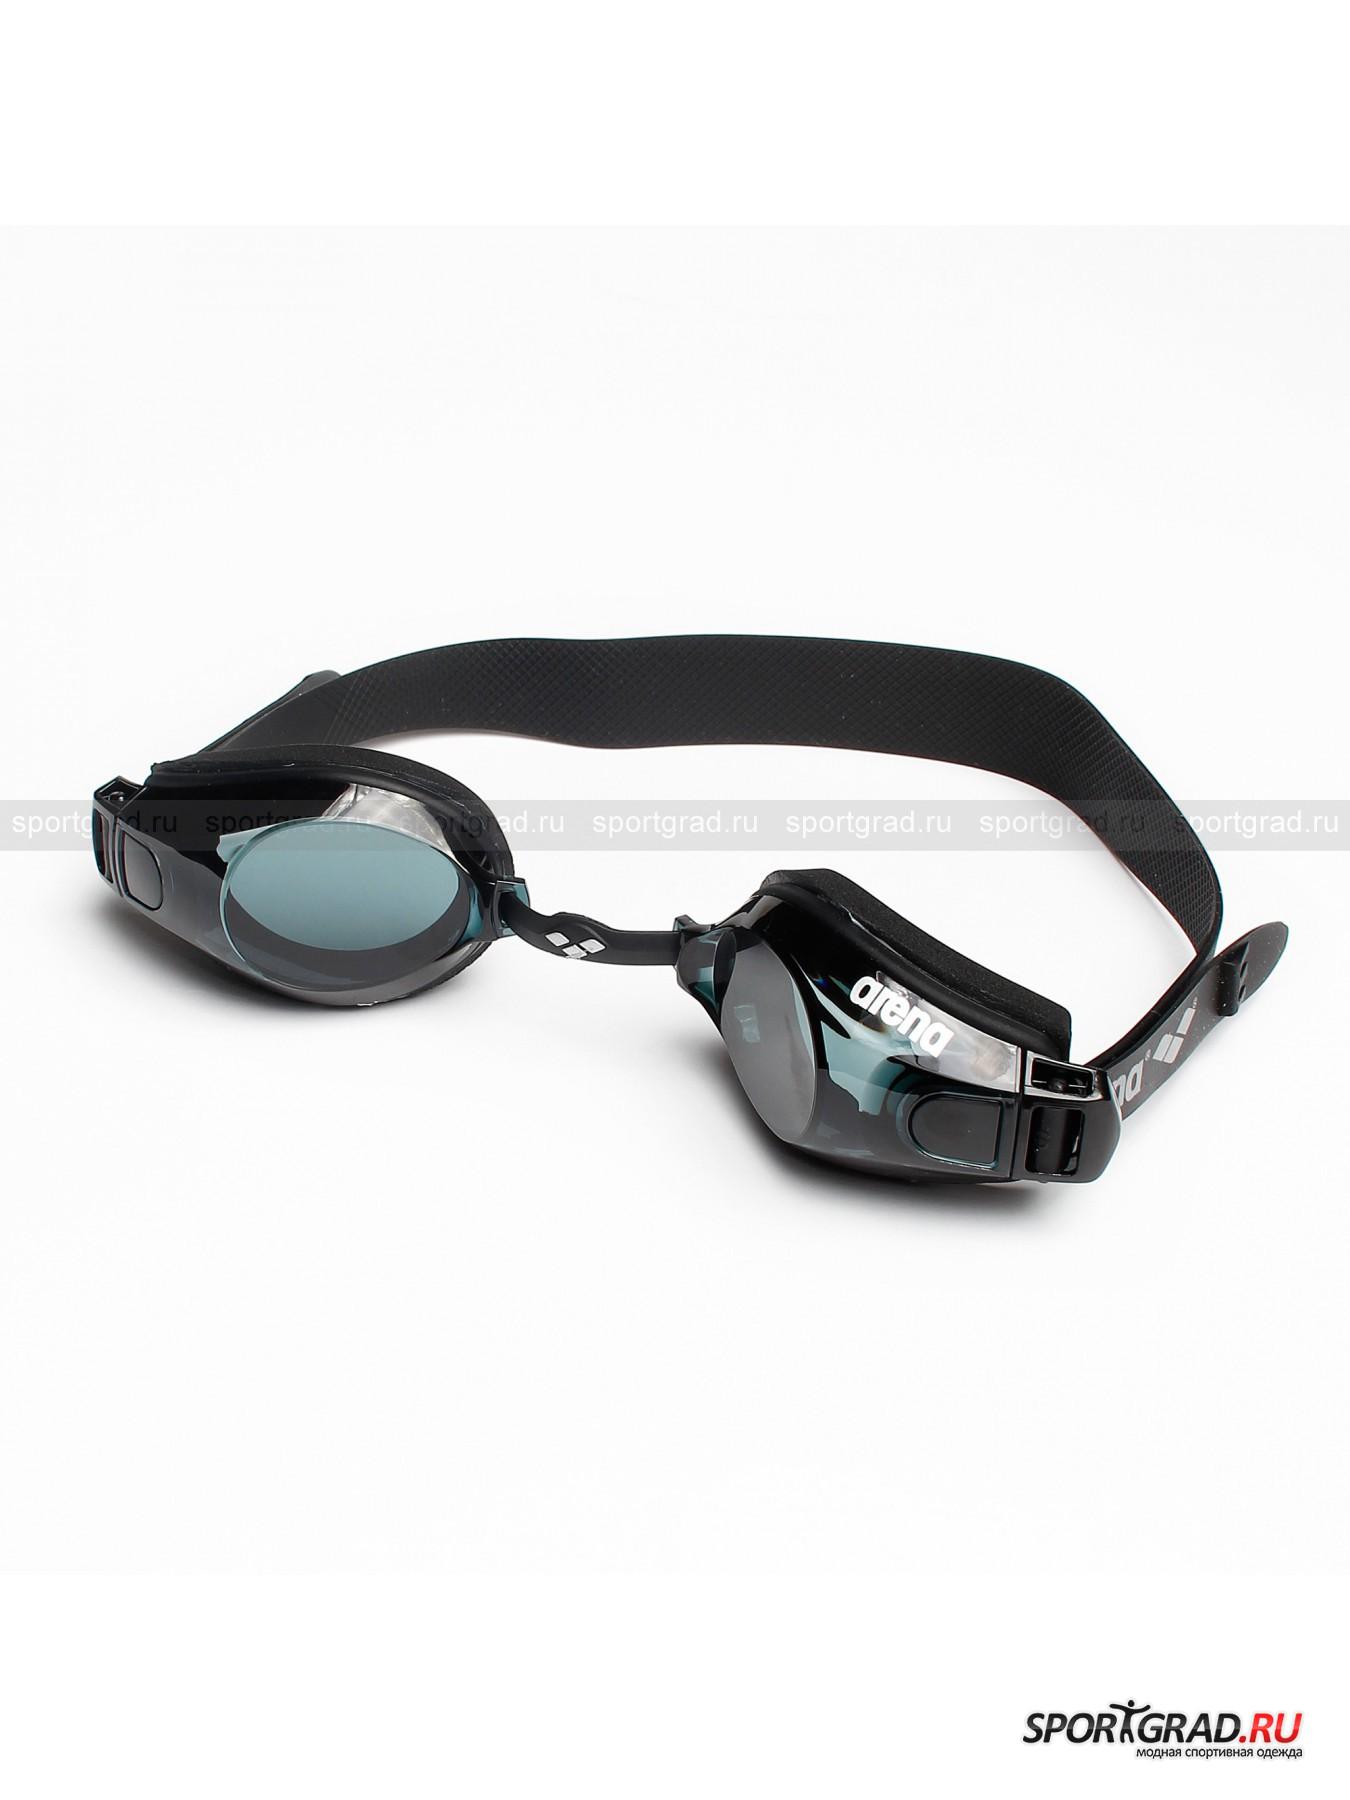 Очки для плавания Zoom Neoprene ARENA от Спортград